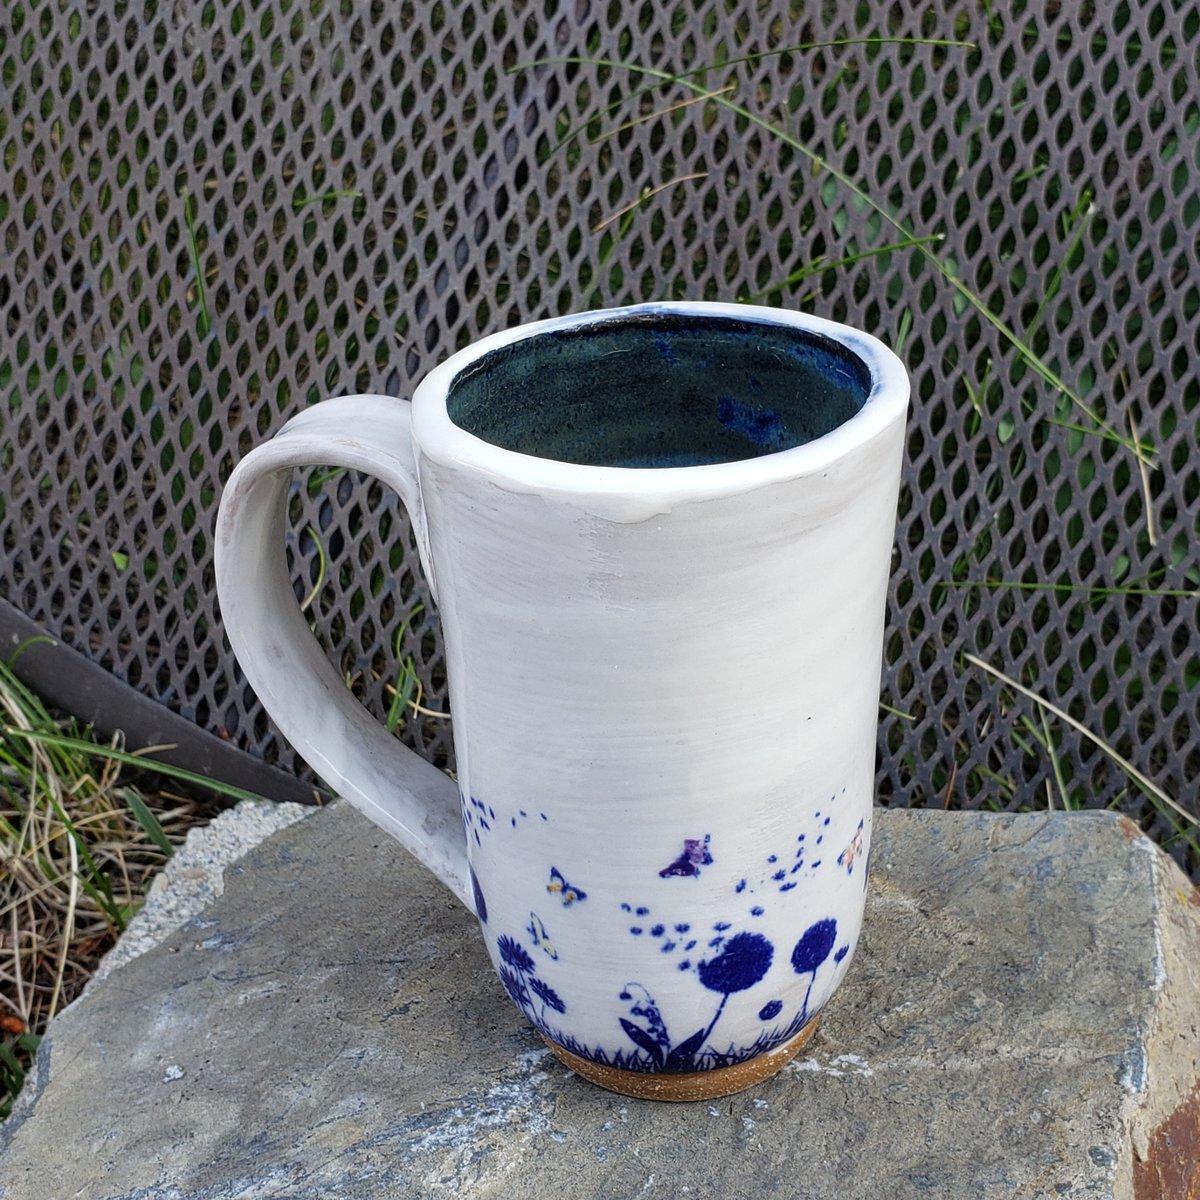 Image of Butterfly Friend Tall Mug: Blue